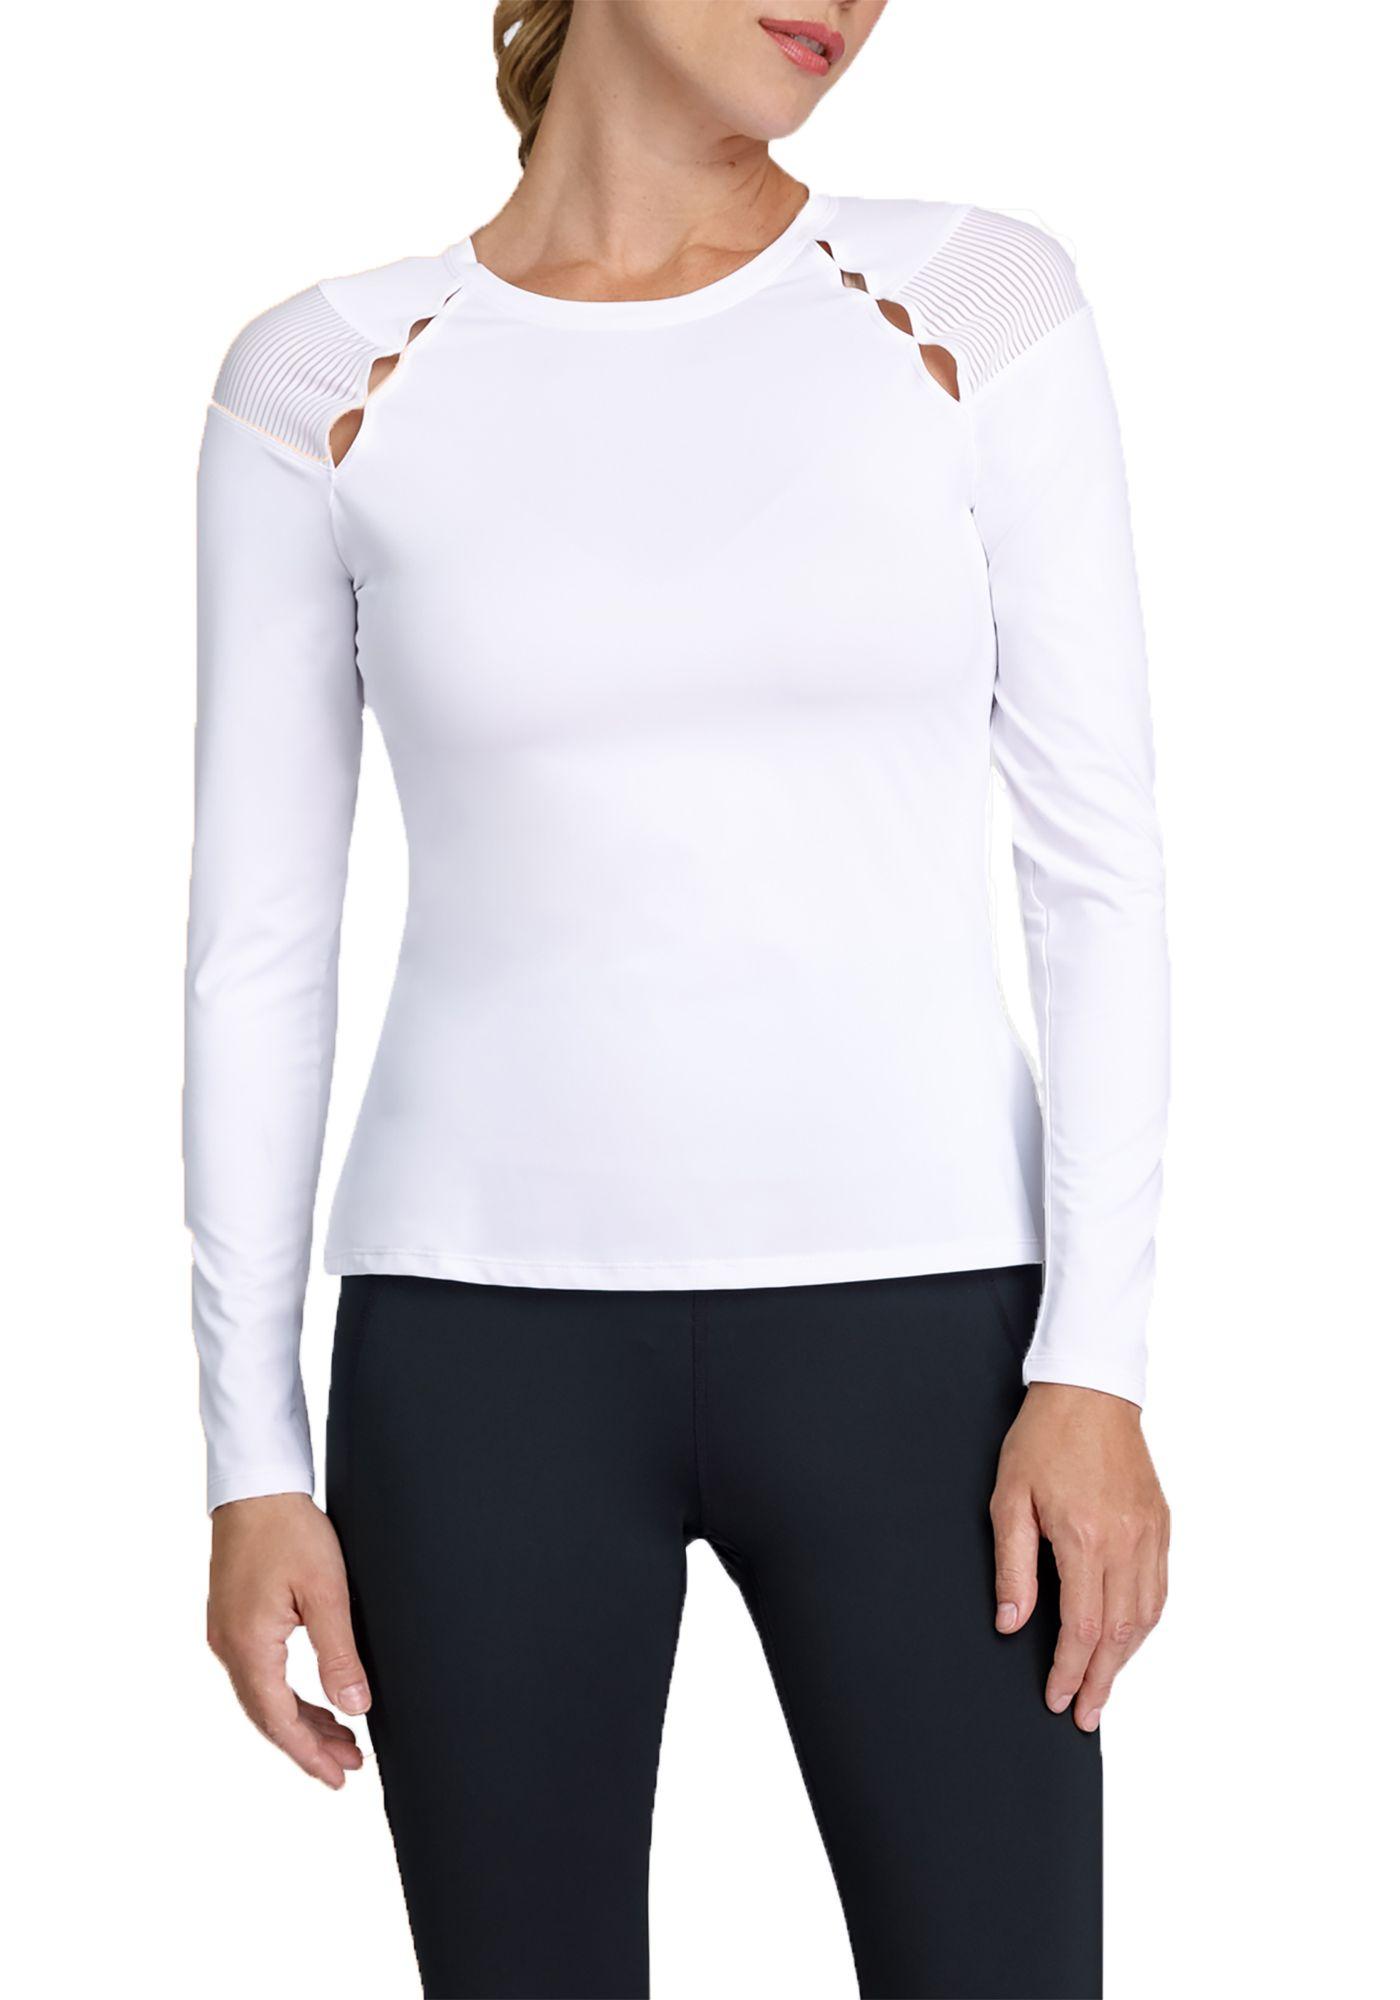 Tail Women's Active Wynter Long Sleeve Tennis Top